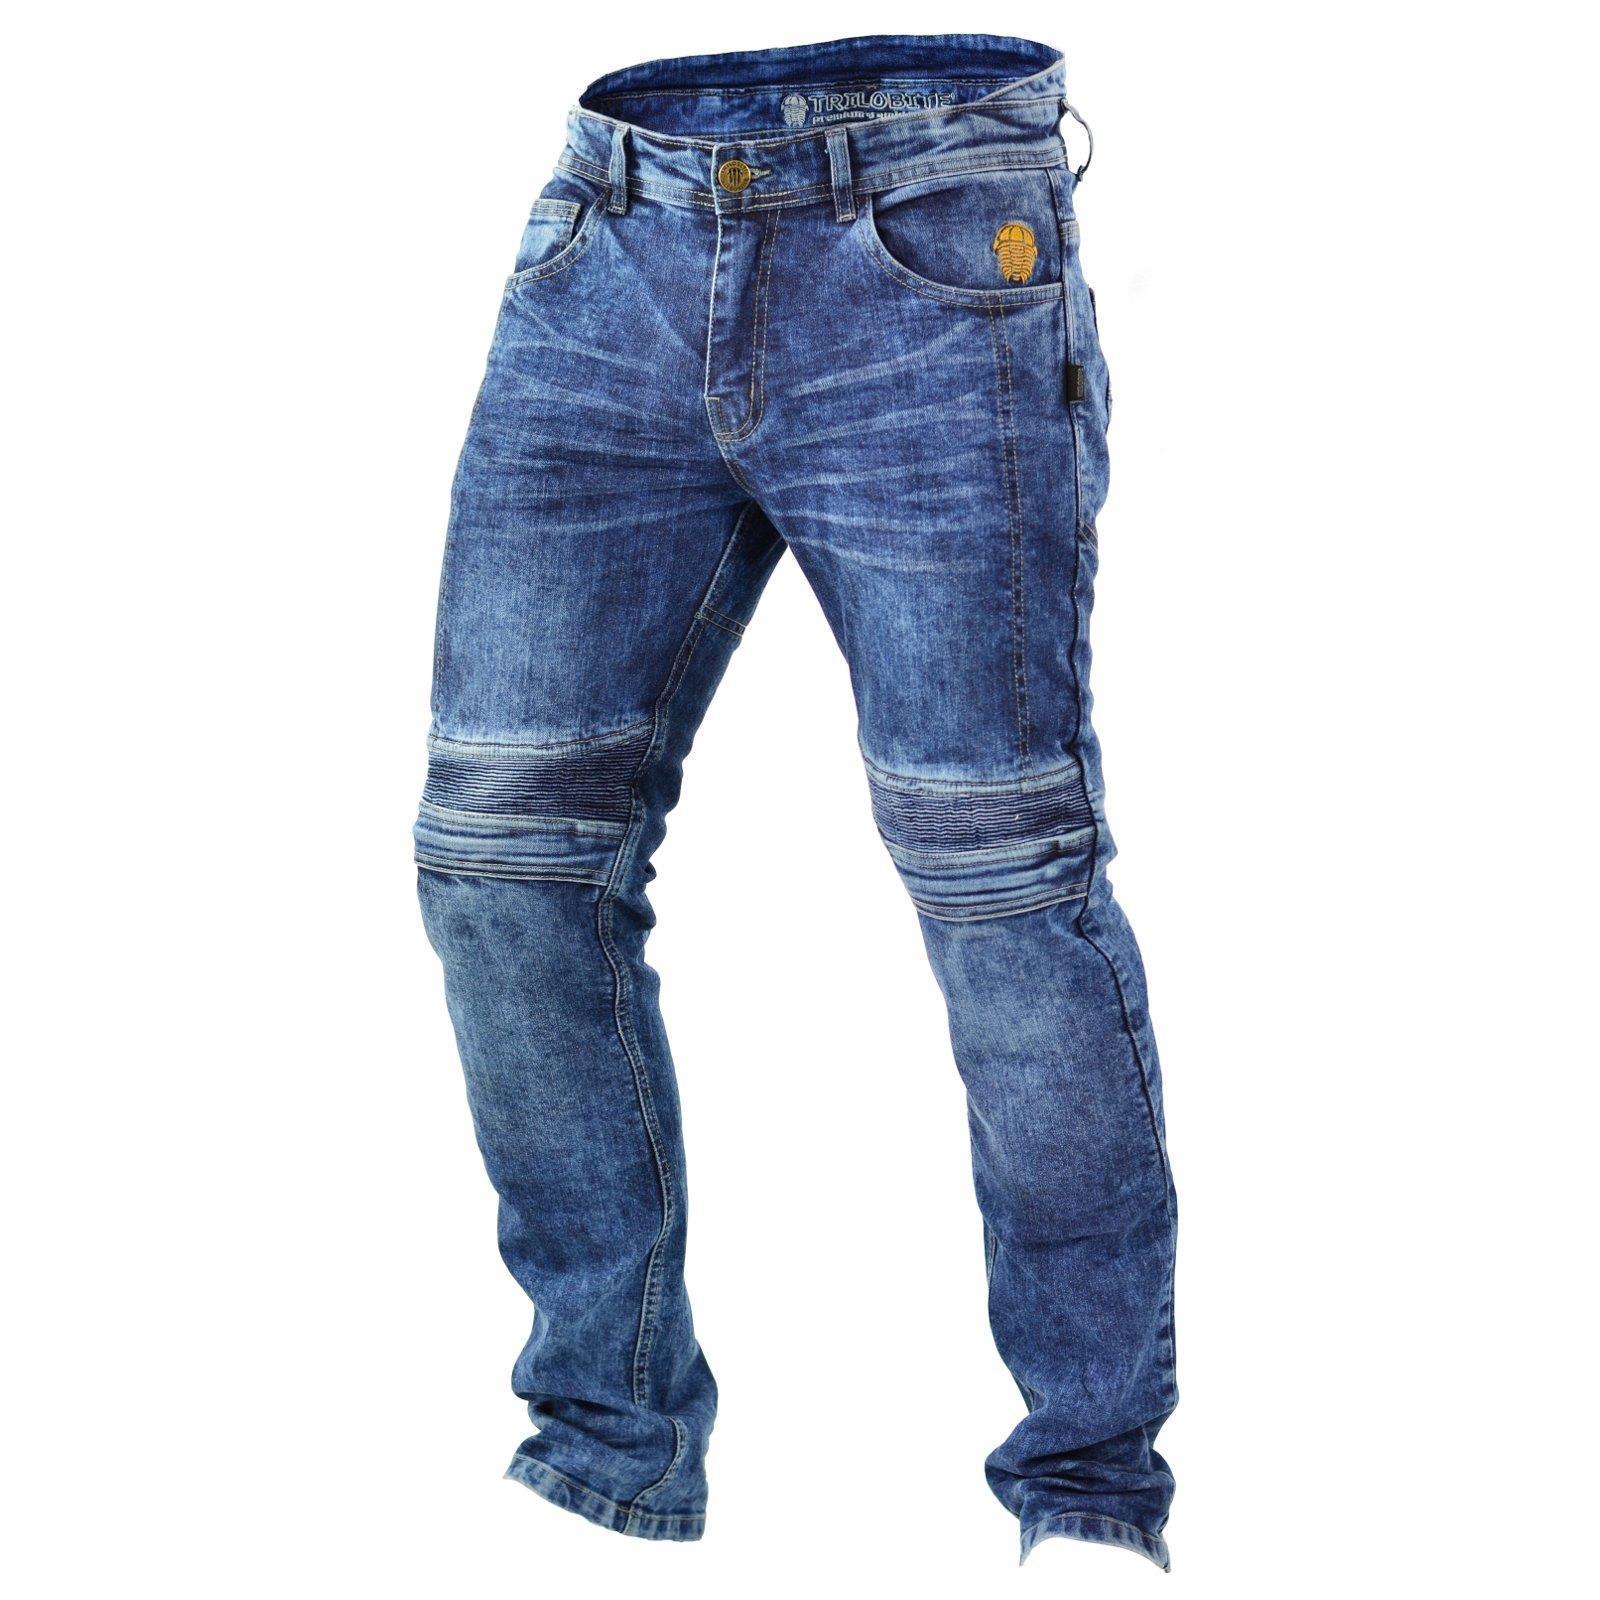 trilobite micas urban herren motorrad jeans protektoren hose abriebfest aramid ebay. Black Bedroom Furniture Sets. Home Design Ideas